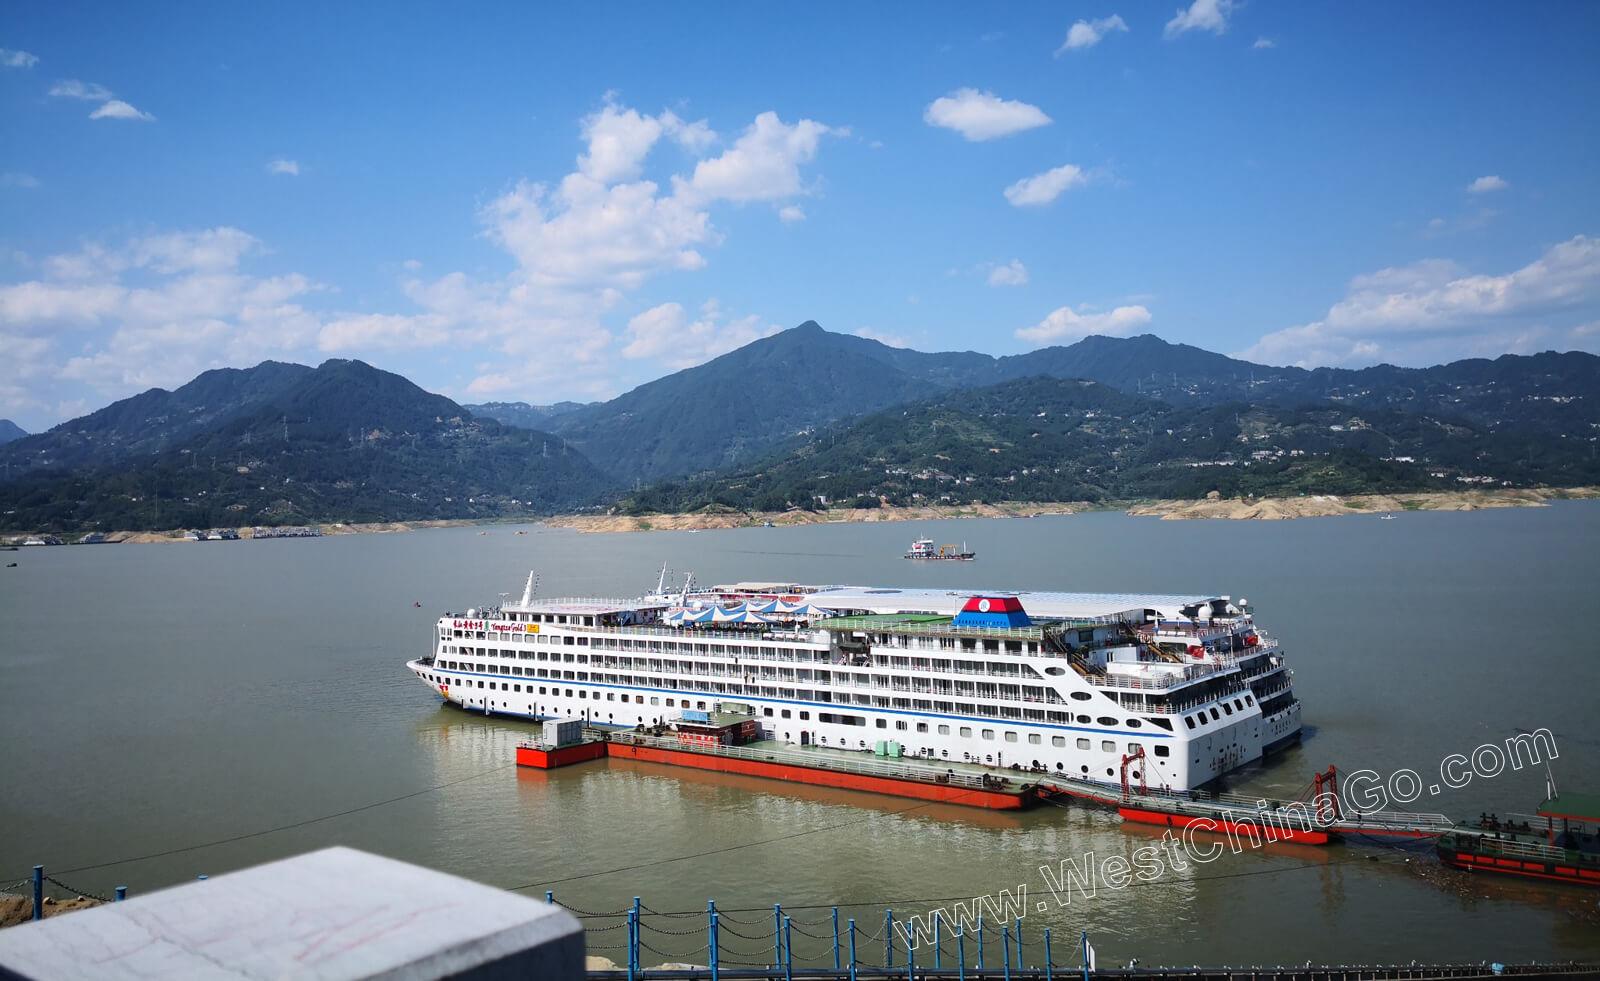 china yangtze river cruise tour